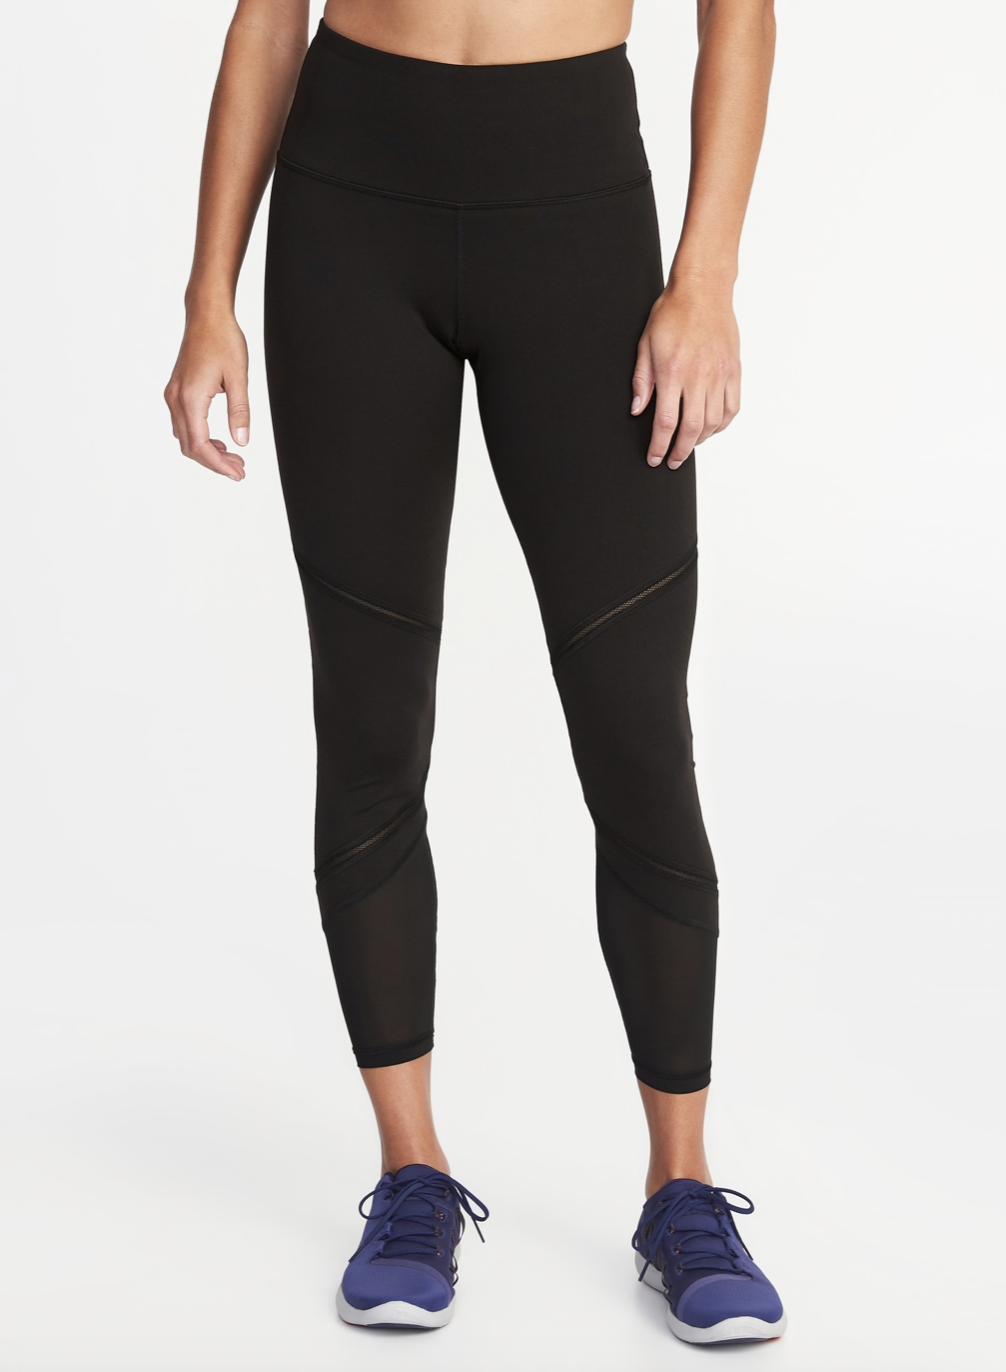 f40d73fc00e3 Old Navy High-Rise 7/8-Length Mesh-Trim Compression Leggings for Women  (Black)